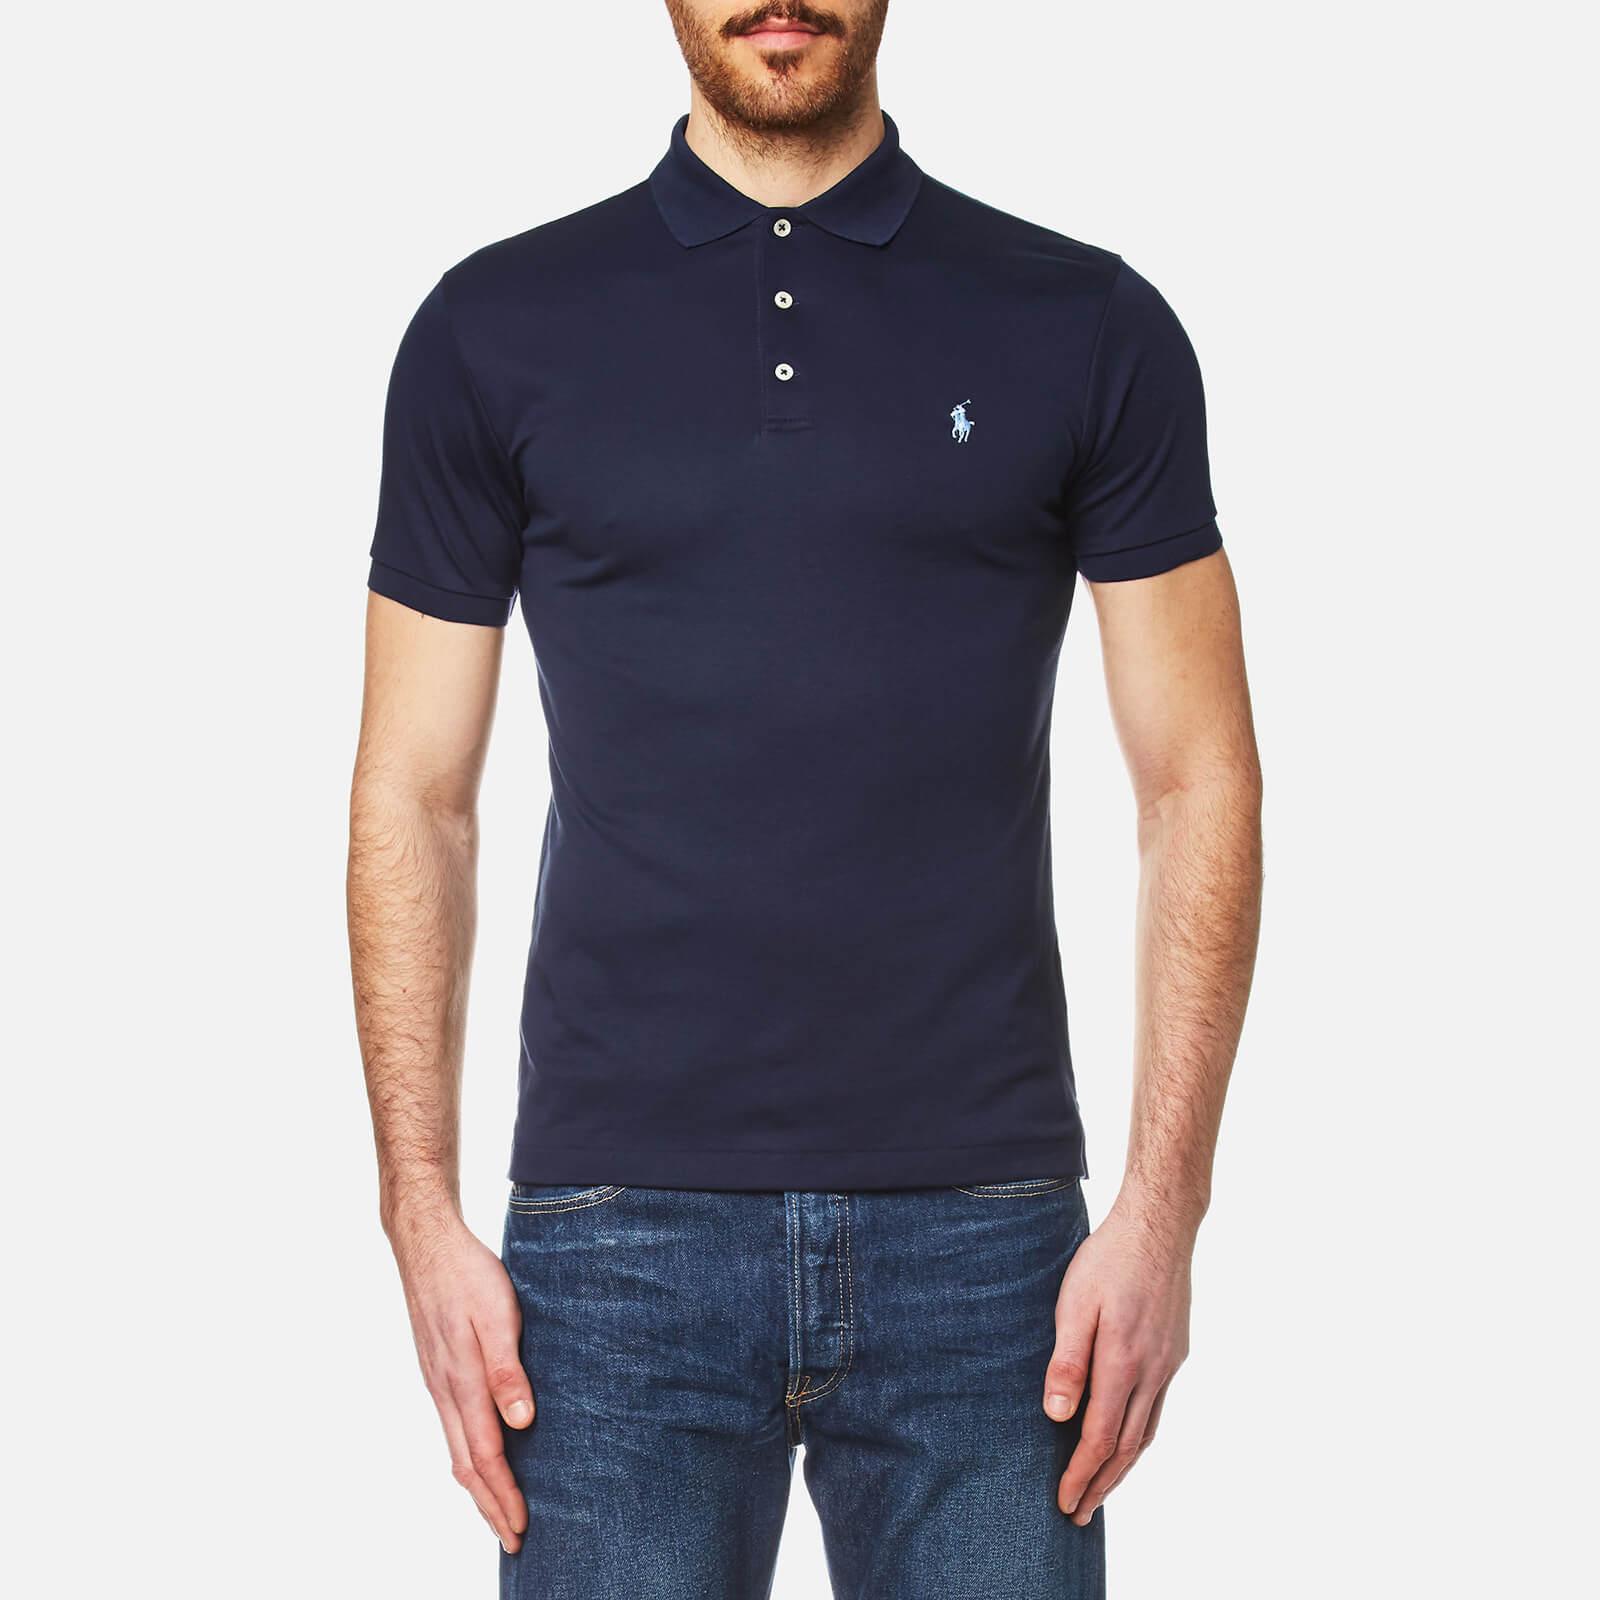 Polo Ralph Lauren Mens Pima Cotton Slim Fit Polo Shirt Navy